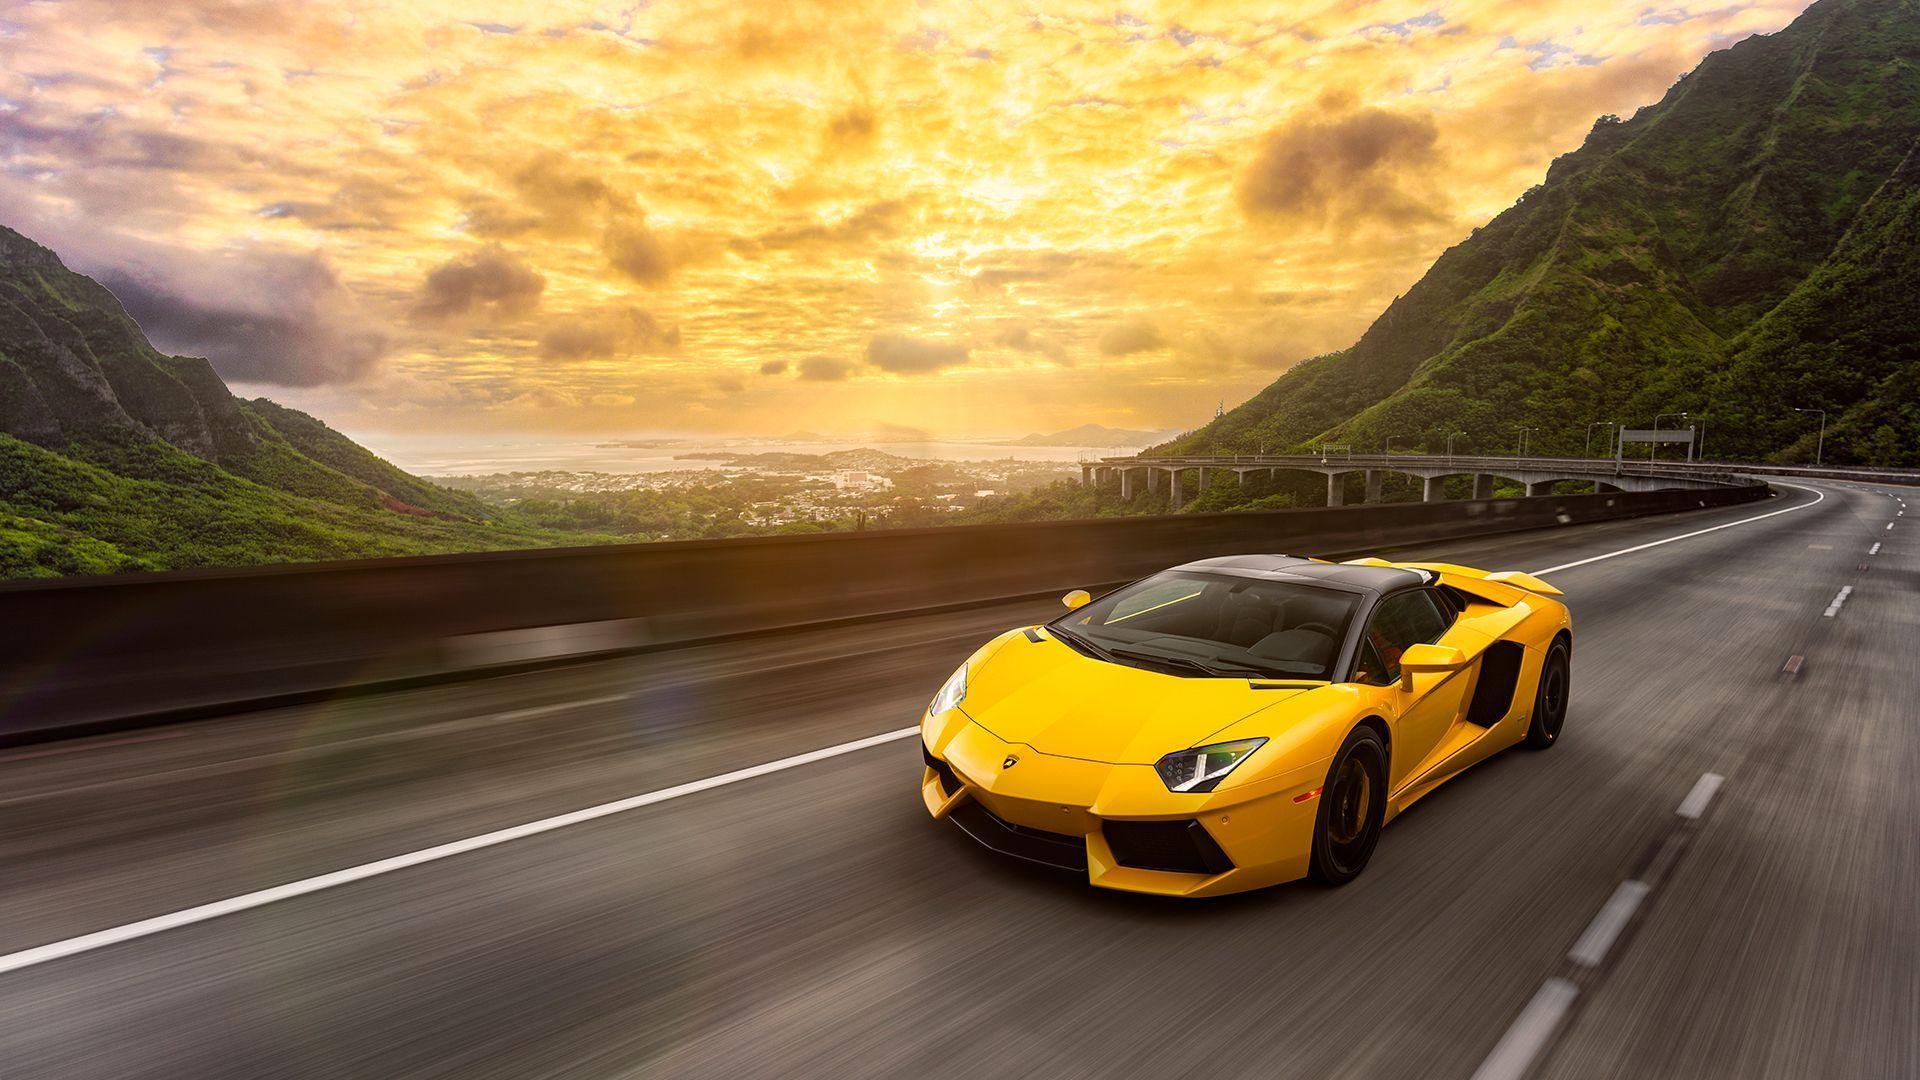 Yellow Lamborghini Wallpapers Top Free Yellow Lamborghini Backgrounds Wallpaperaccess